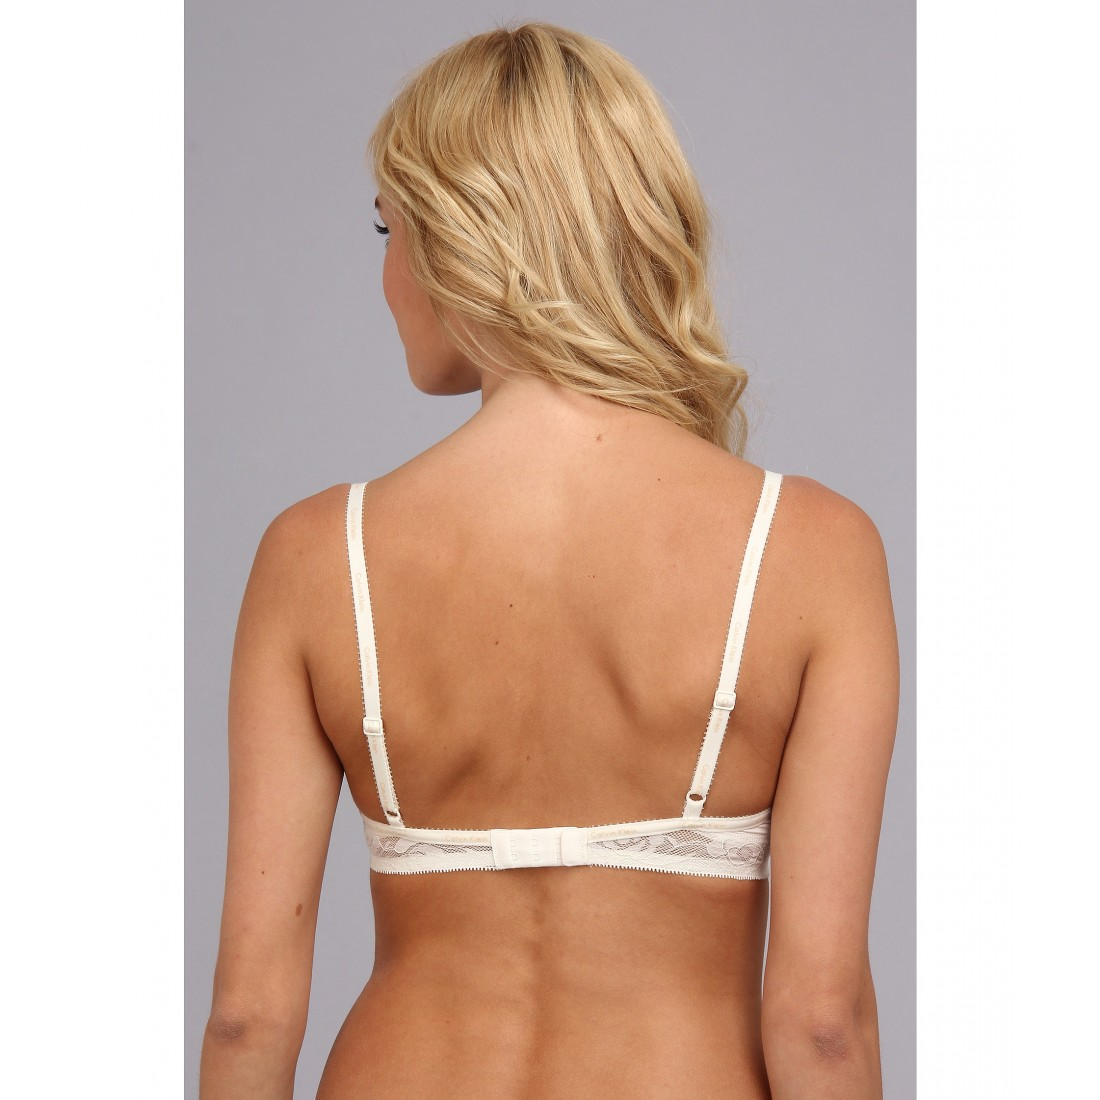 2aaa3f02d1161 Calvin Klein Underwear Modern Signature Essential T-Shirt Bra F3778  6PM8317795 Ivory